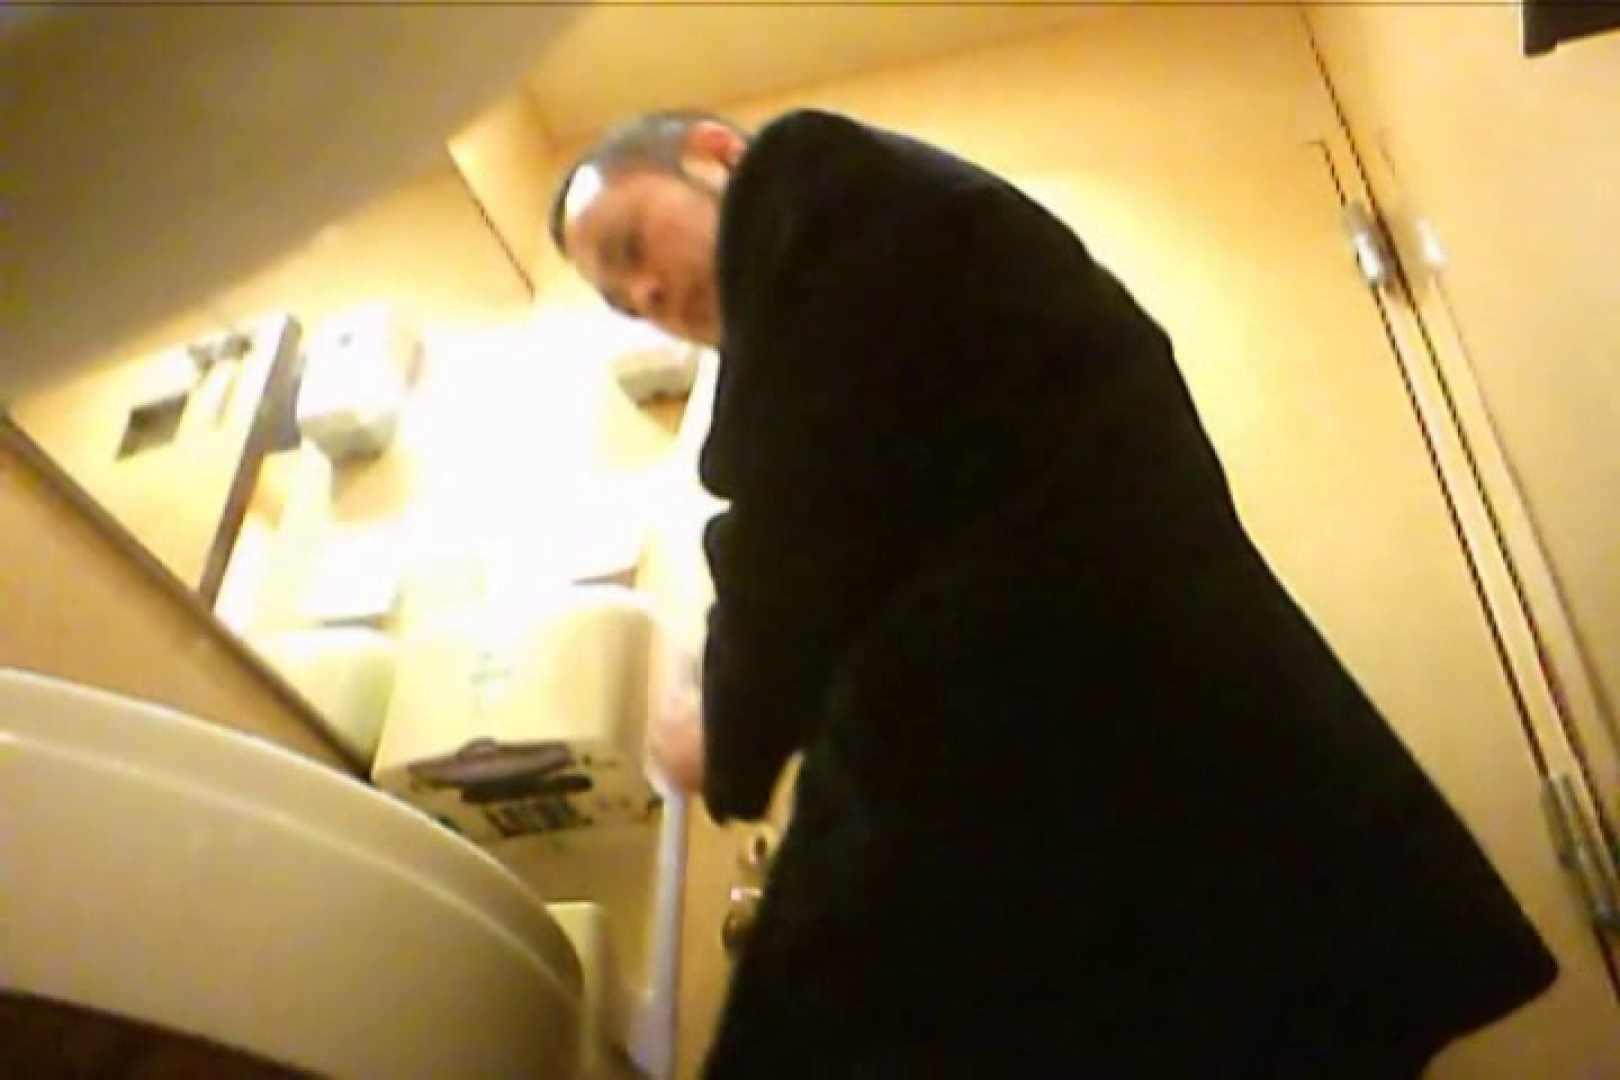 SEASON 2ND!掴み取りさんの洗面所覗き!in新幹線!VOL.12 0 | スーツボーイズ  95pic 45